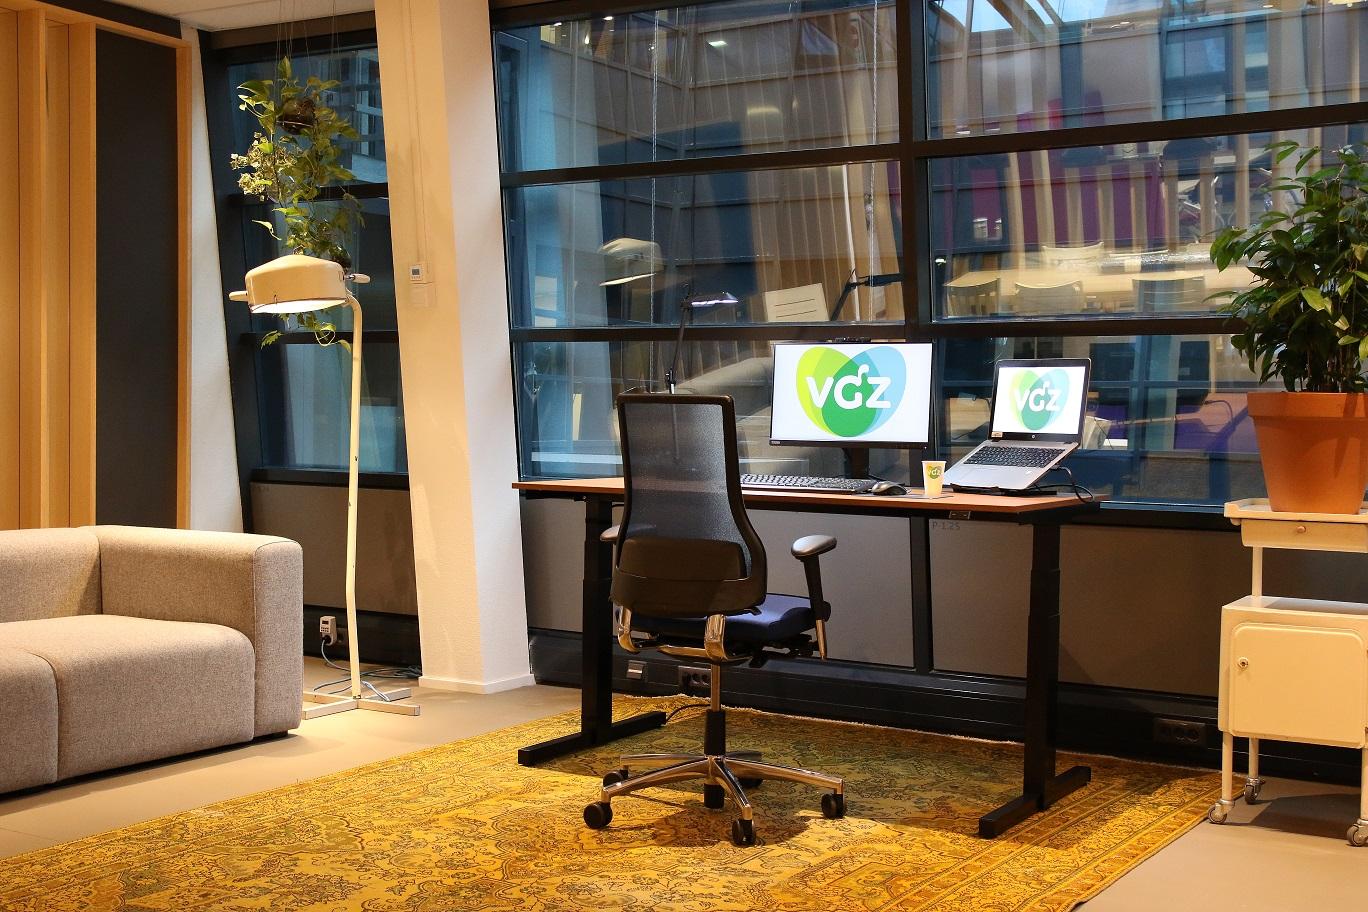 Voel je thuis bij VGZ met thuiswerkplek.nl